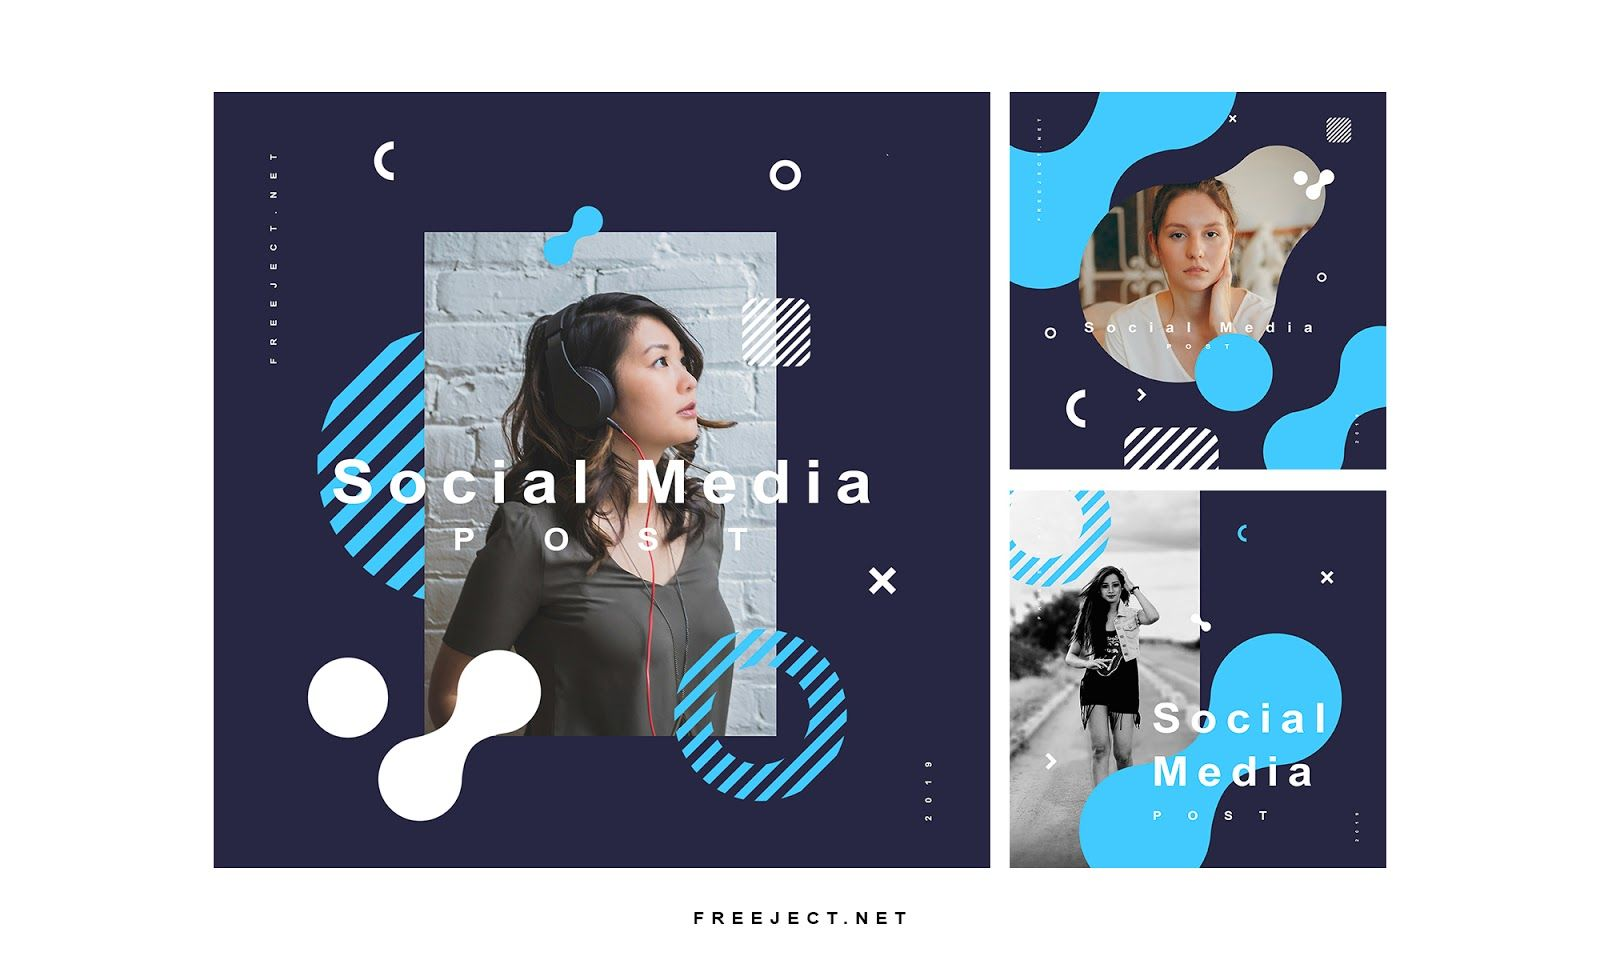 Freeject Net Free Download Social Media Post Template Vol 2 P Facebook Post Design Social Media Post Social Media